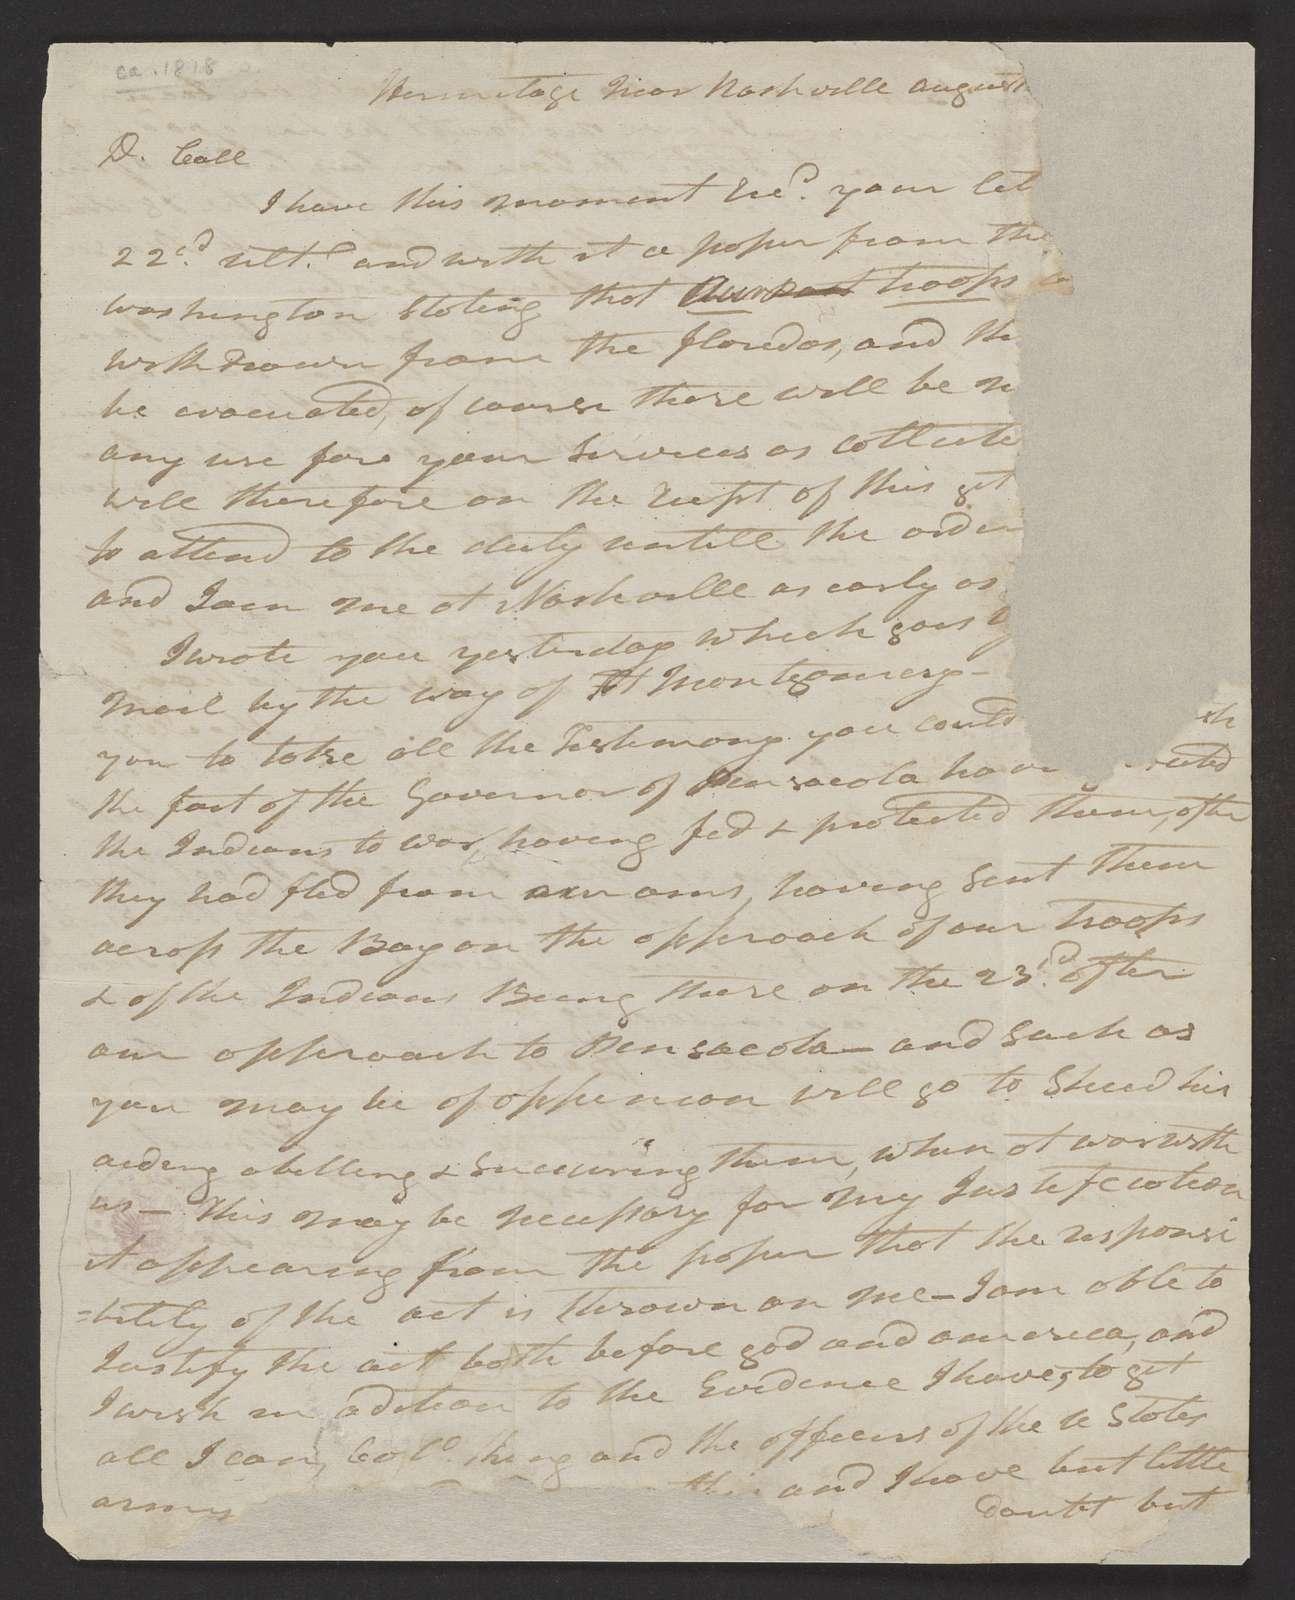 Andrew Jackson to Capt. Richard Keith Call,